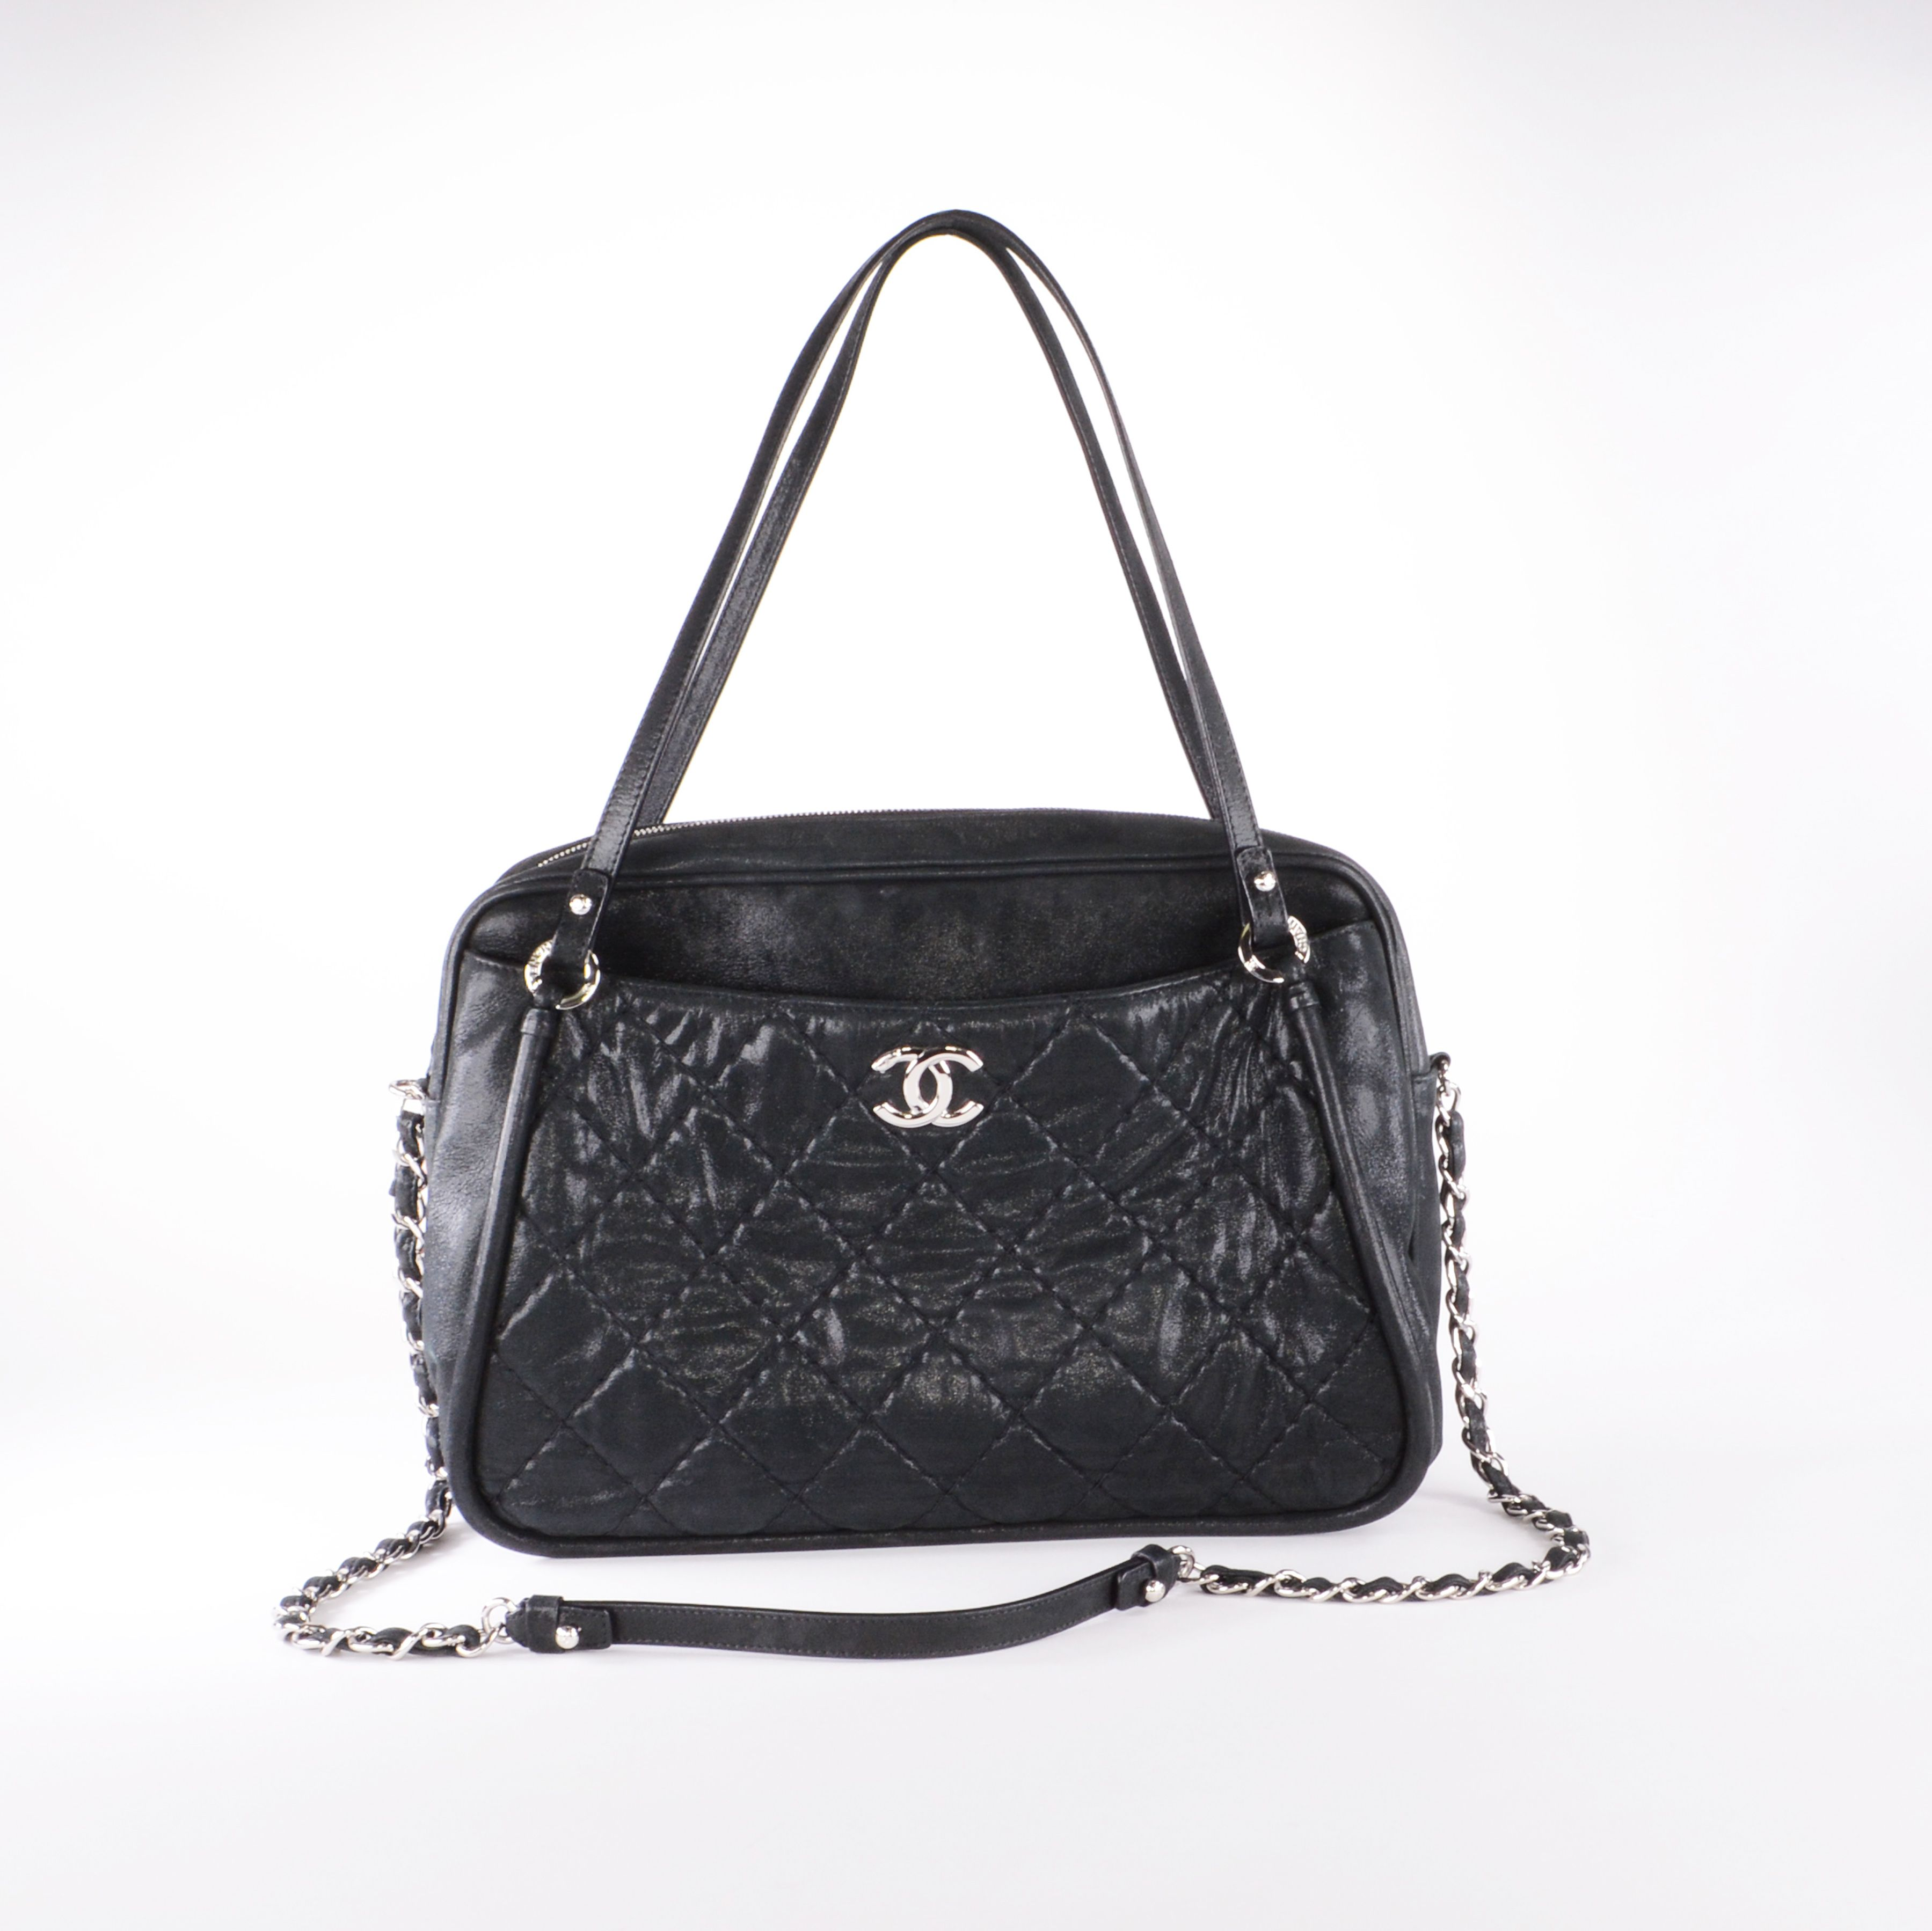 5xx Error Chanel Tote Shoulder Bag Bags